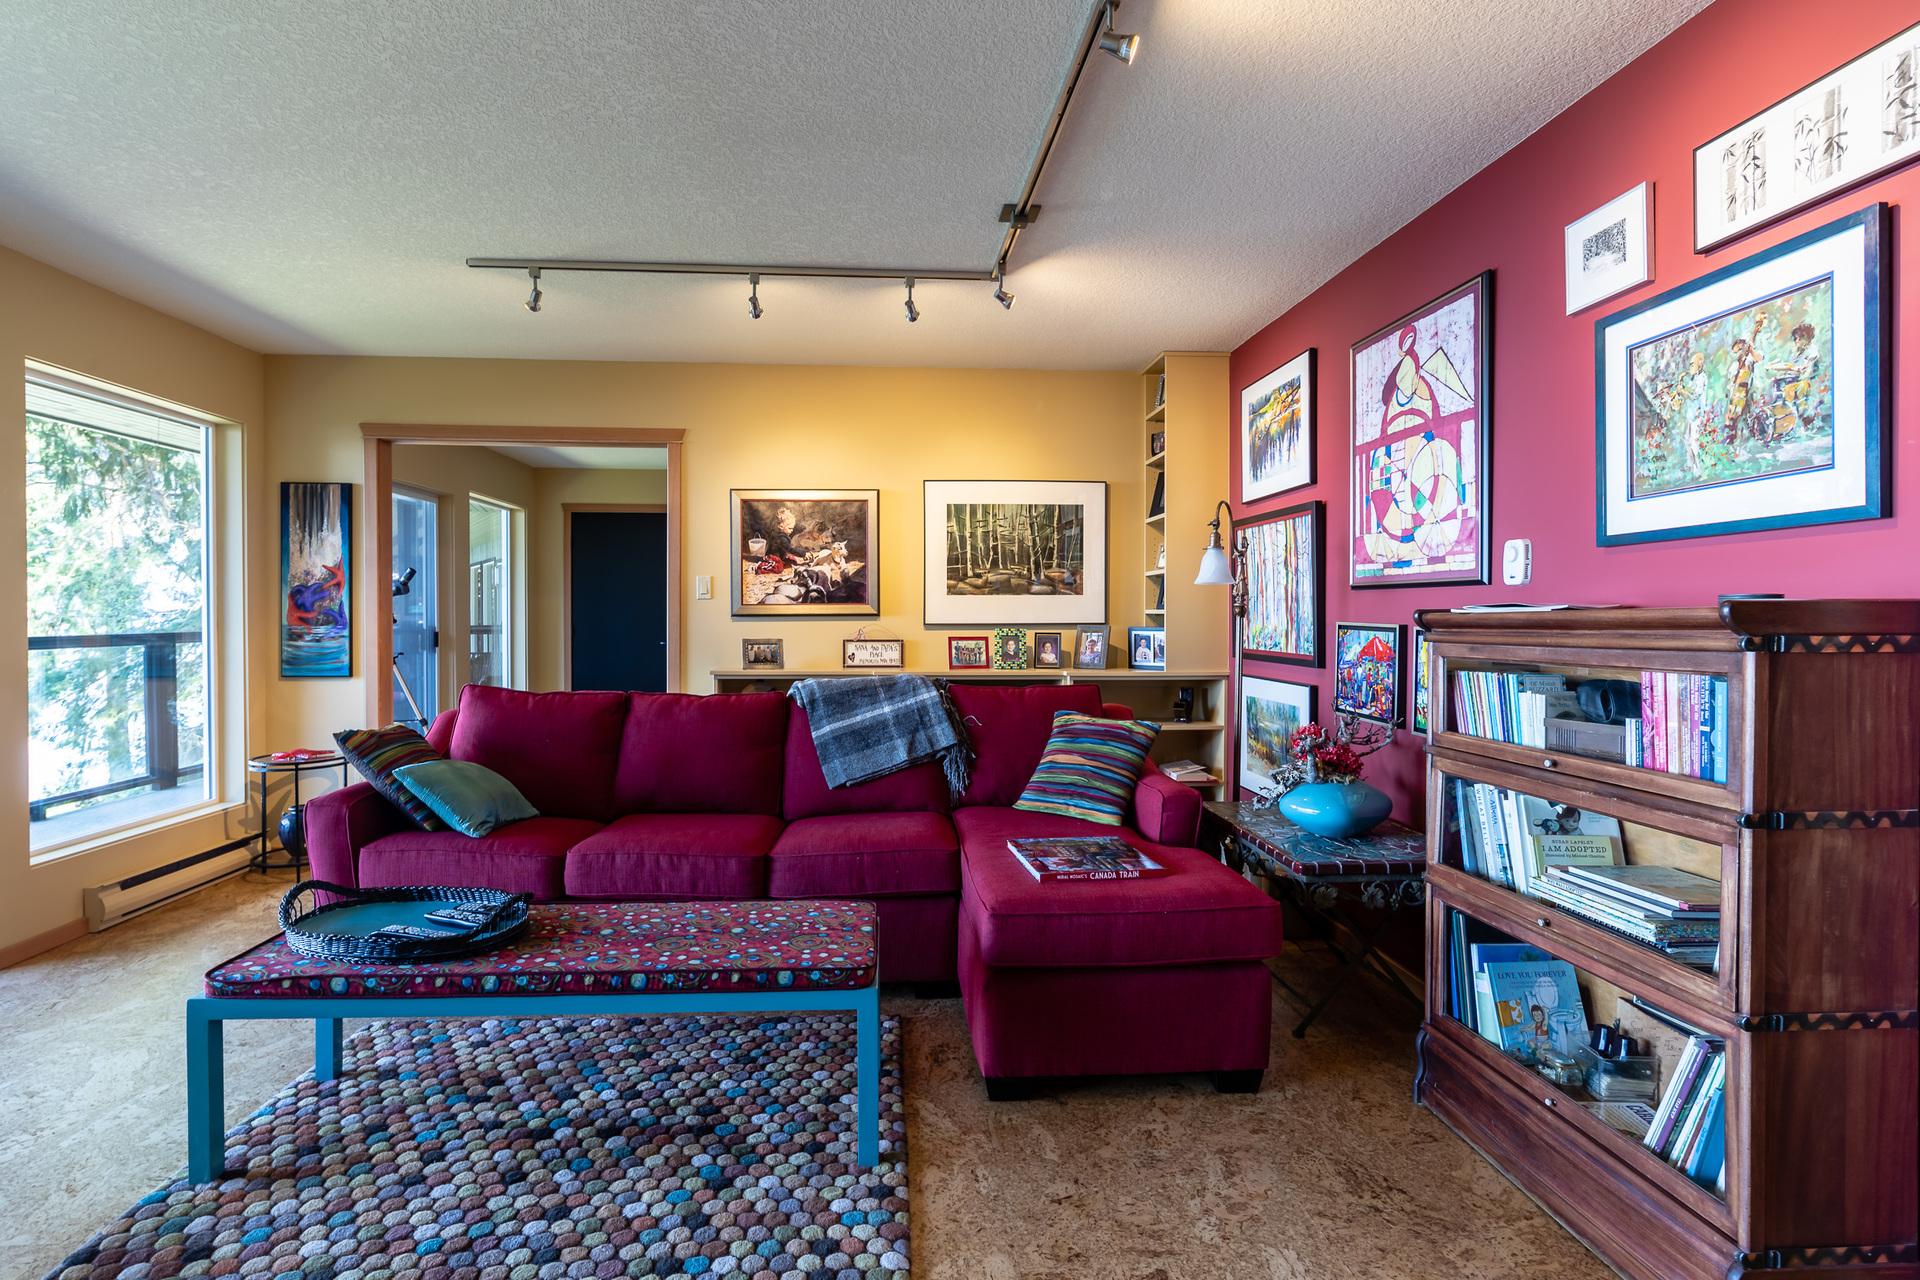 Second Master Suite Living Room at 5101 Island Highway West, Qualicum Beach, Zone 05 - Parksville/Qualicum